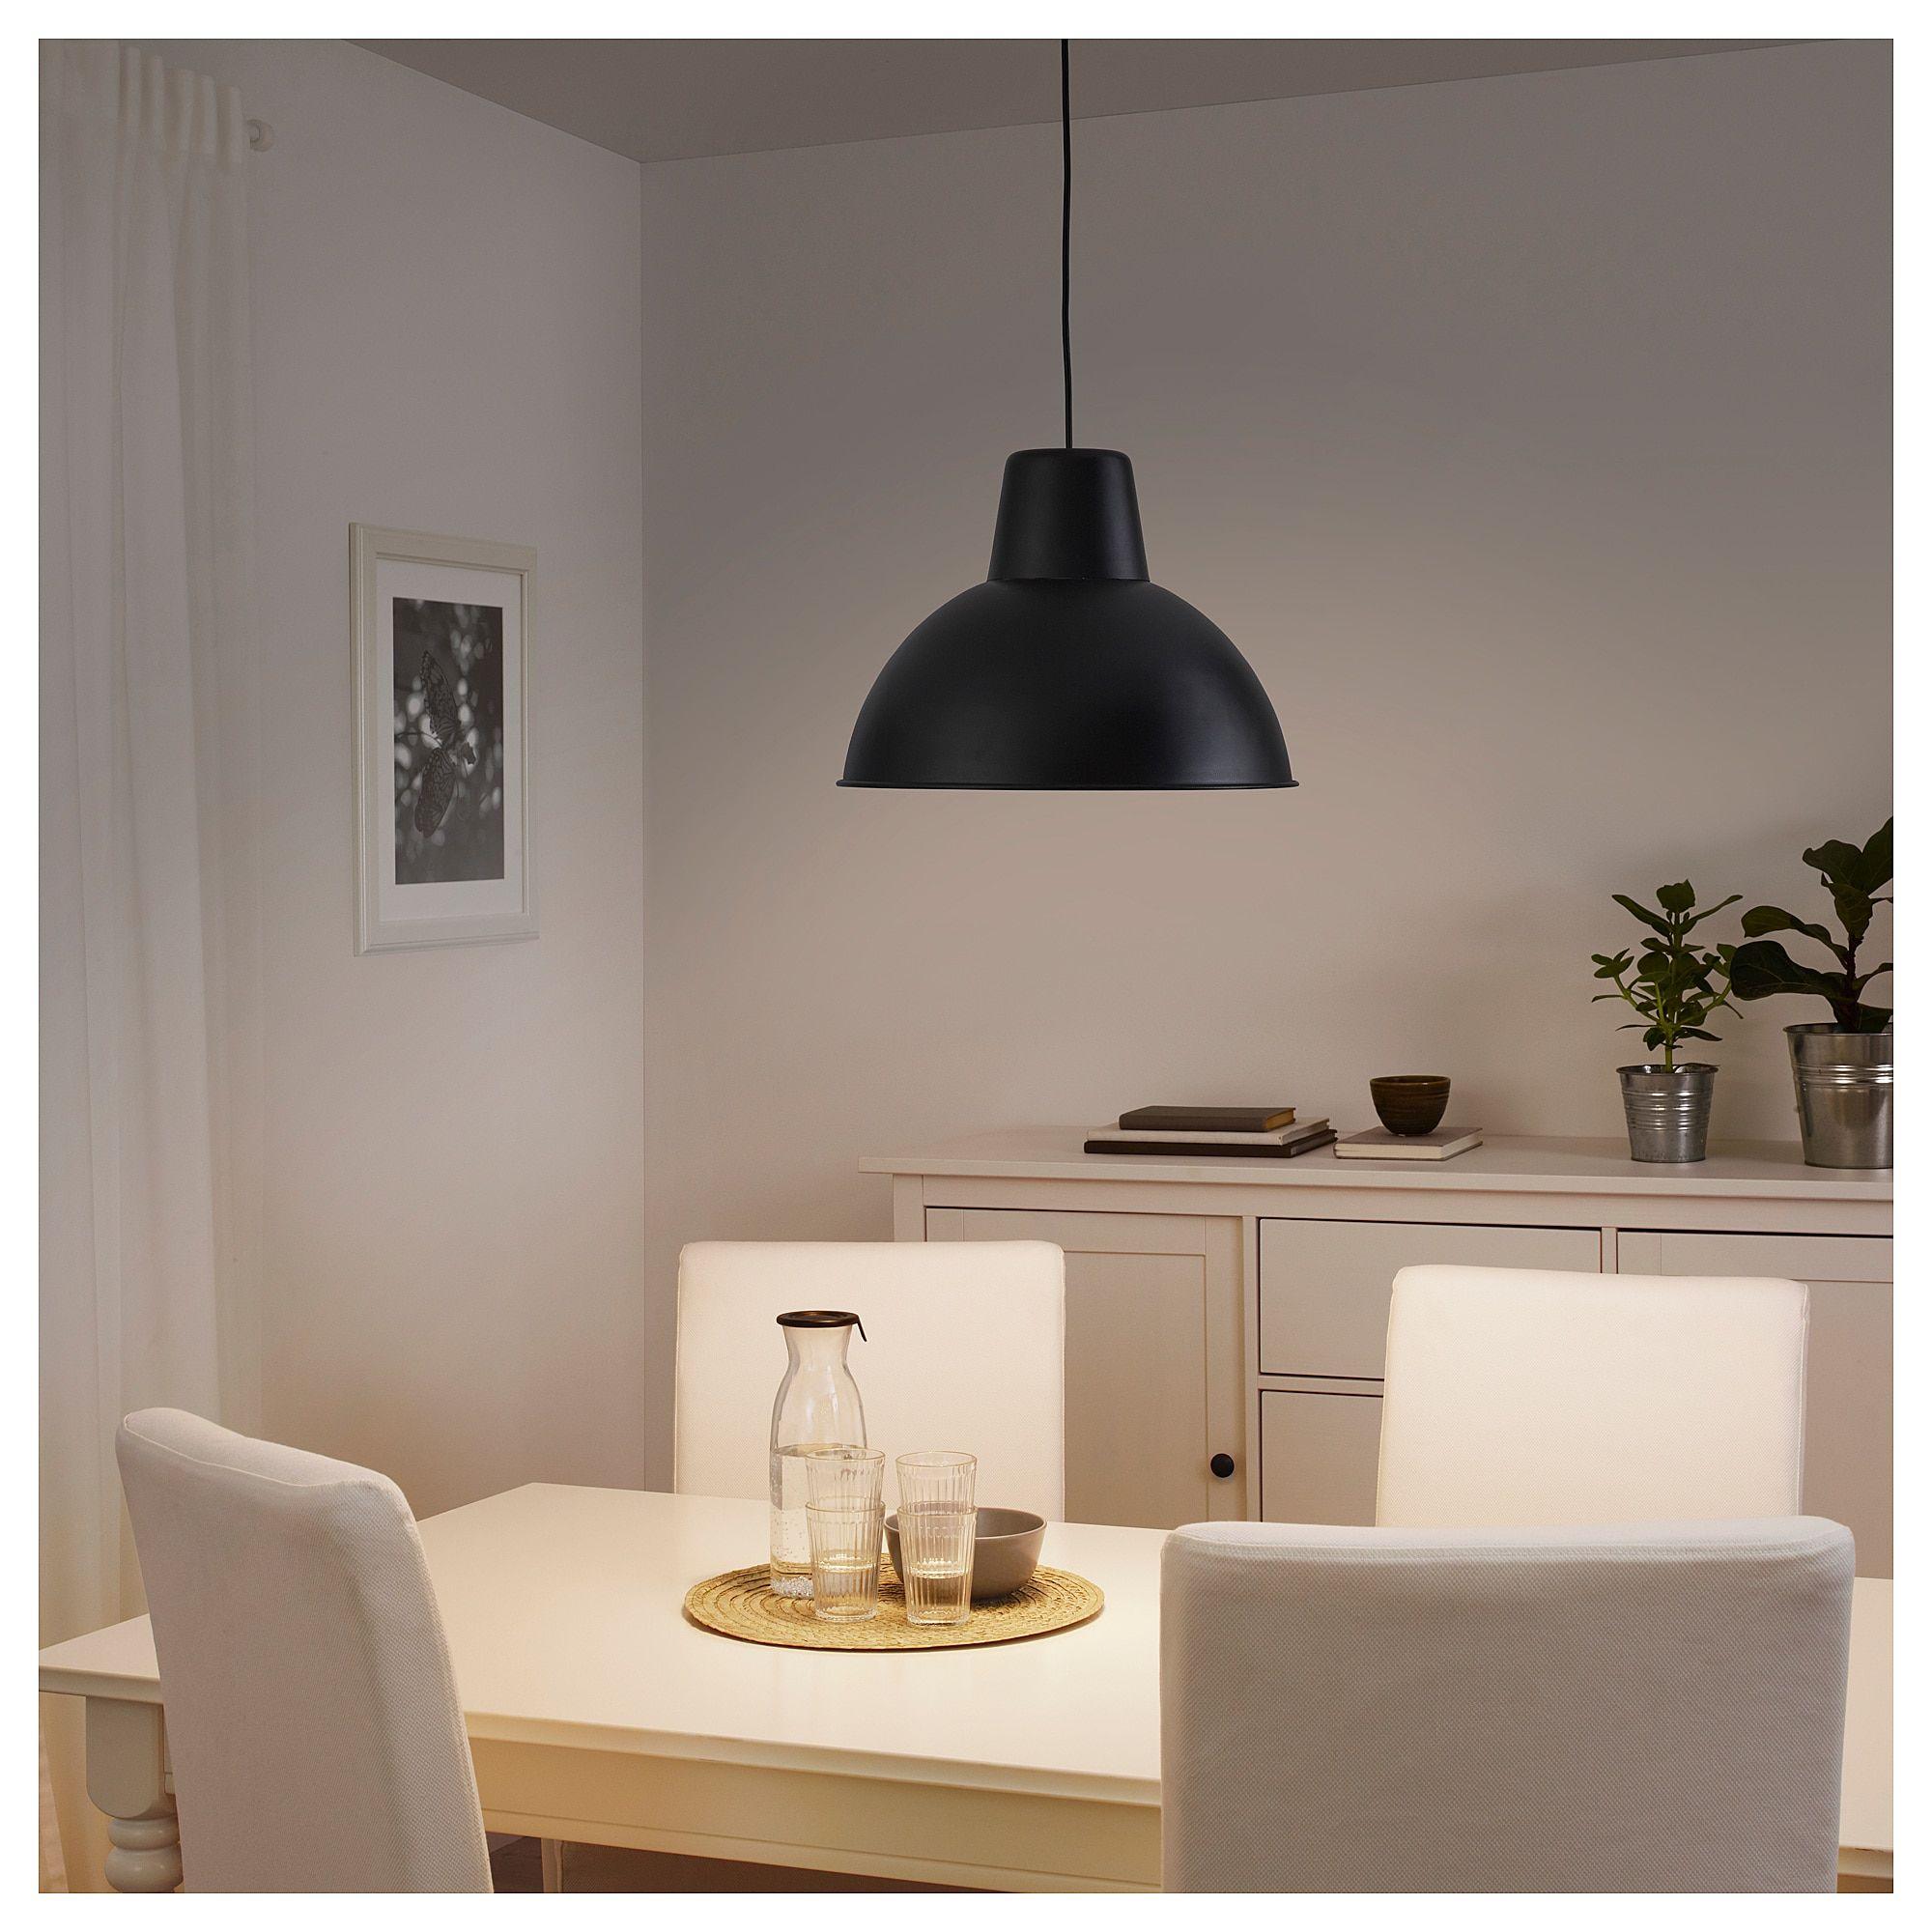 Skurup Pendant Lamp Black 15 38 Cm En 2020 Luminaires Salle A Manger Suspension Ikea Lampe Suspendue